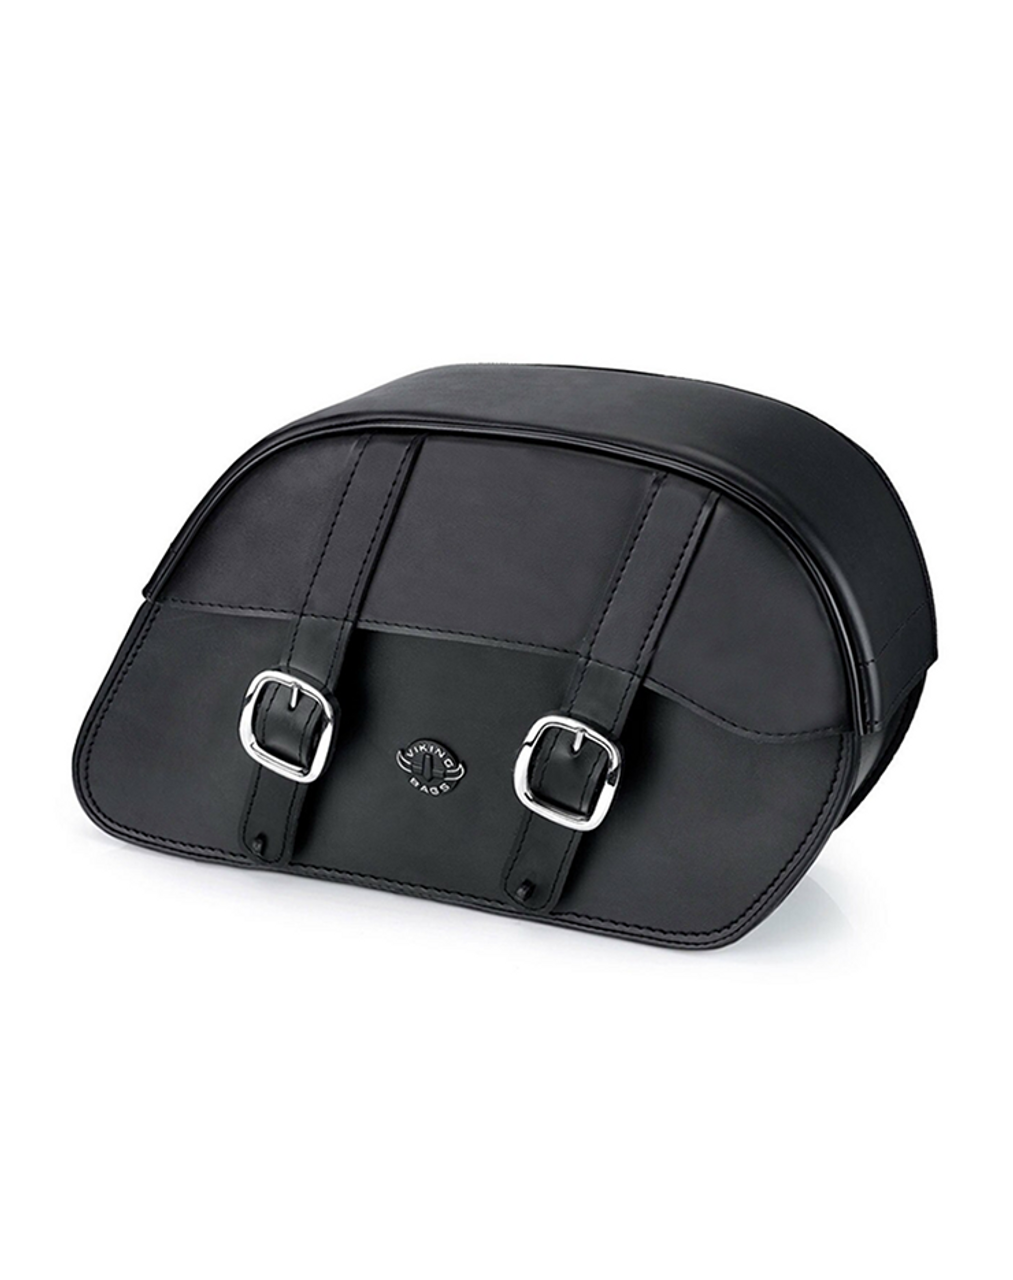 Viking Slanted Medium Motorcycle Saddlebags For Harley Softail Standard FXST Bag view